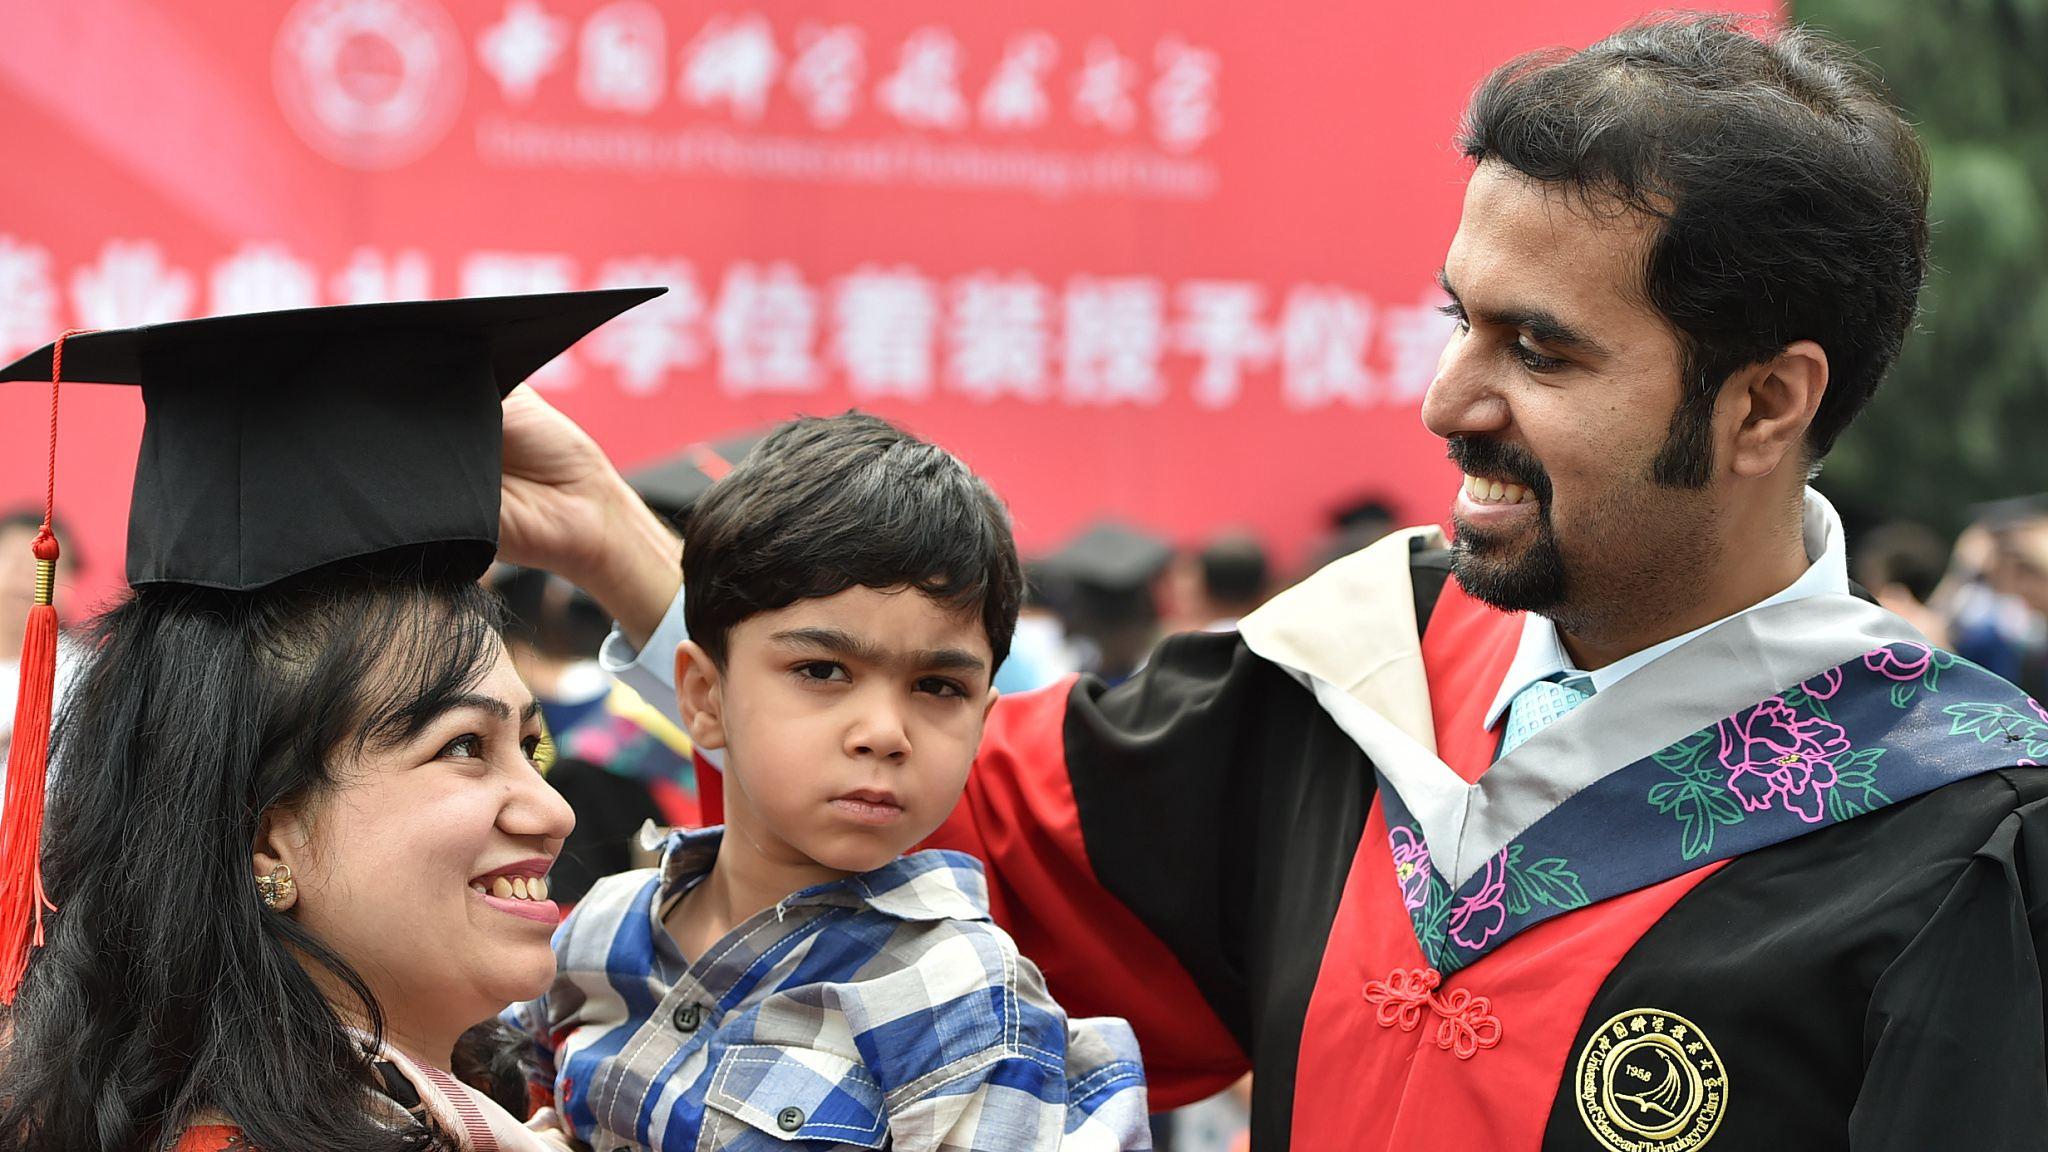 China a major contributor of human resource development in Pakistan